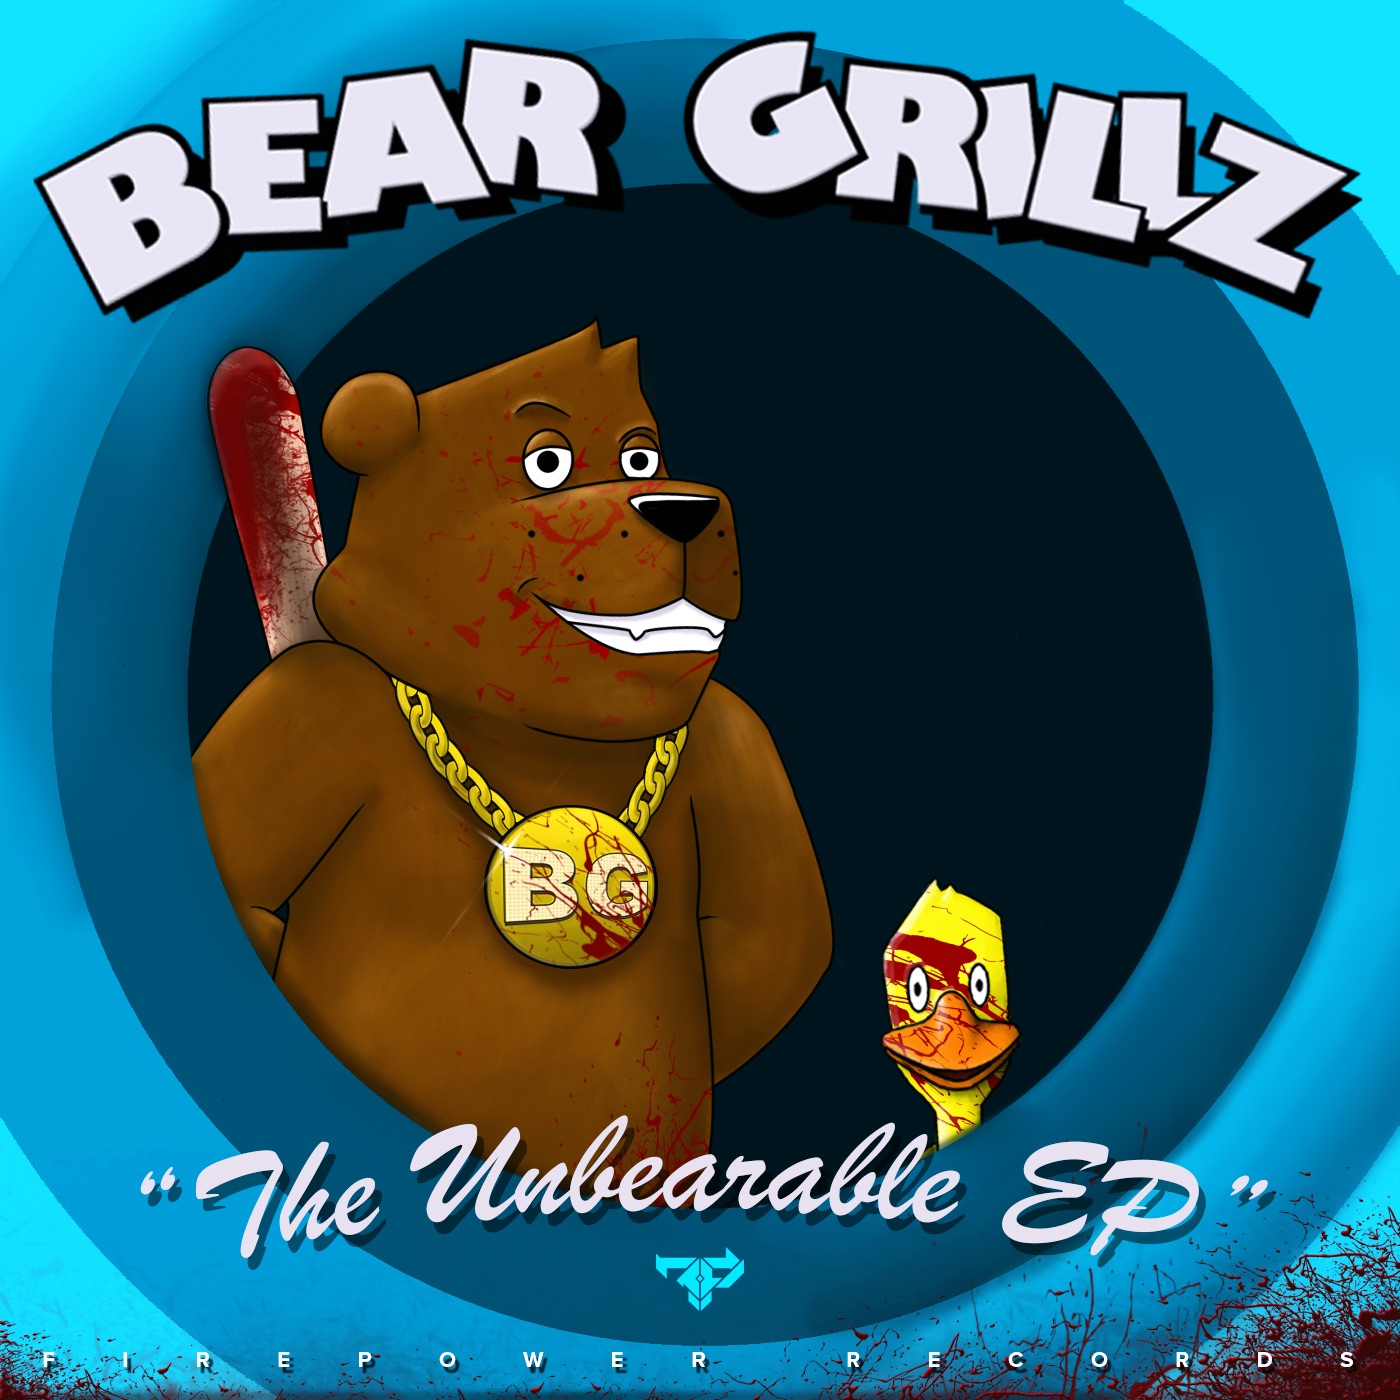 The Unbearable - EP